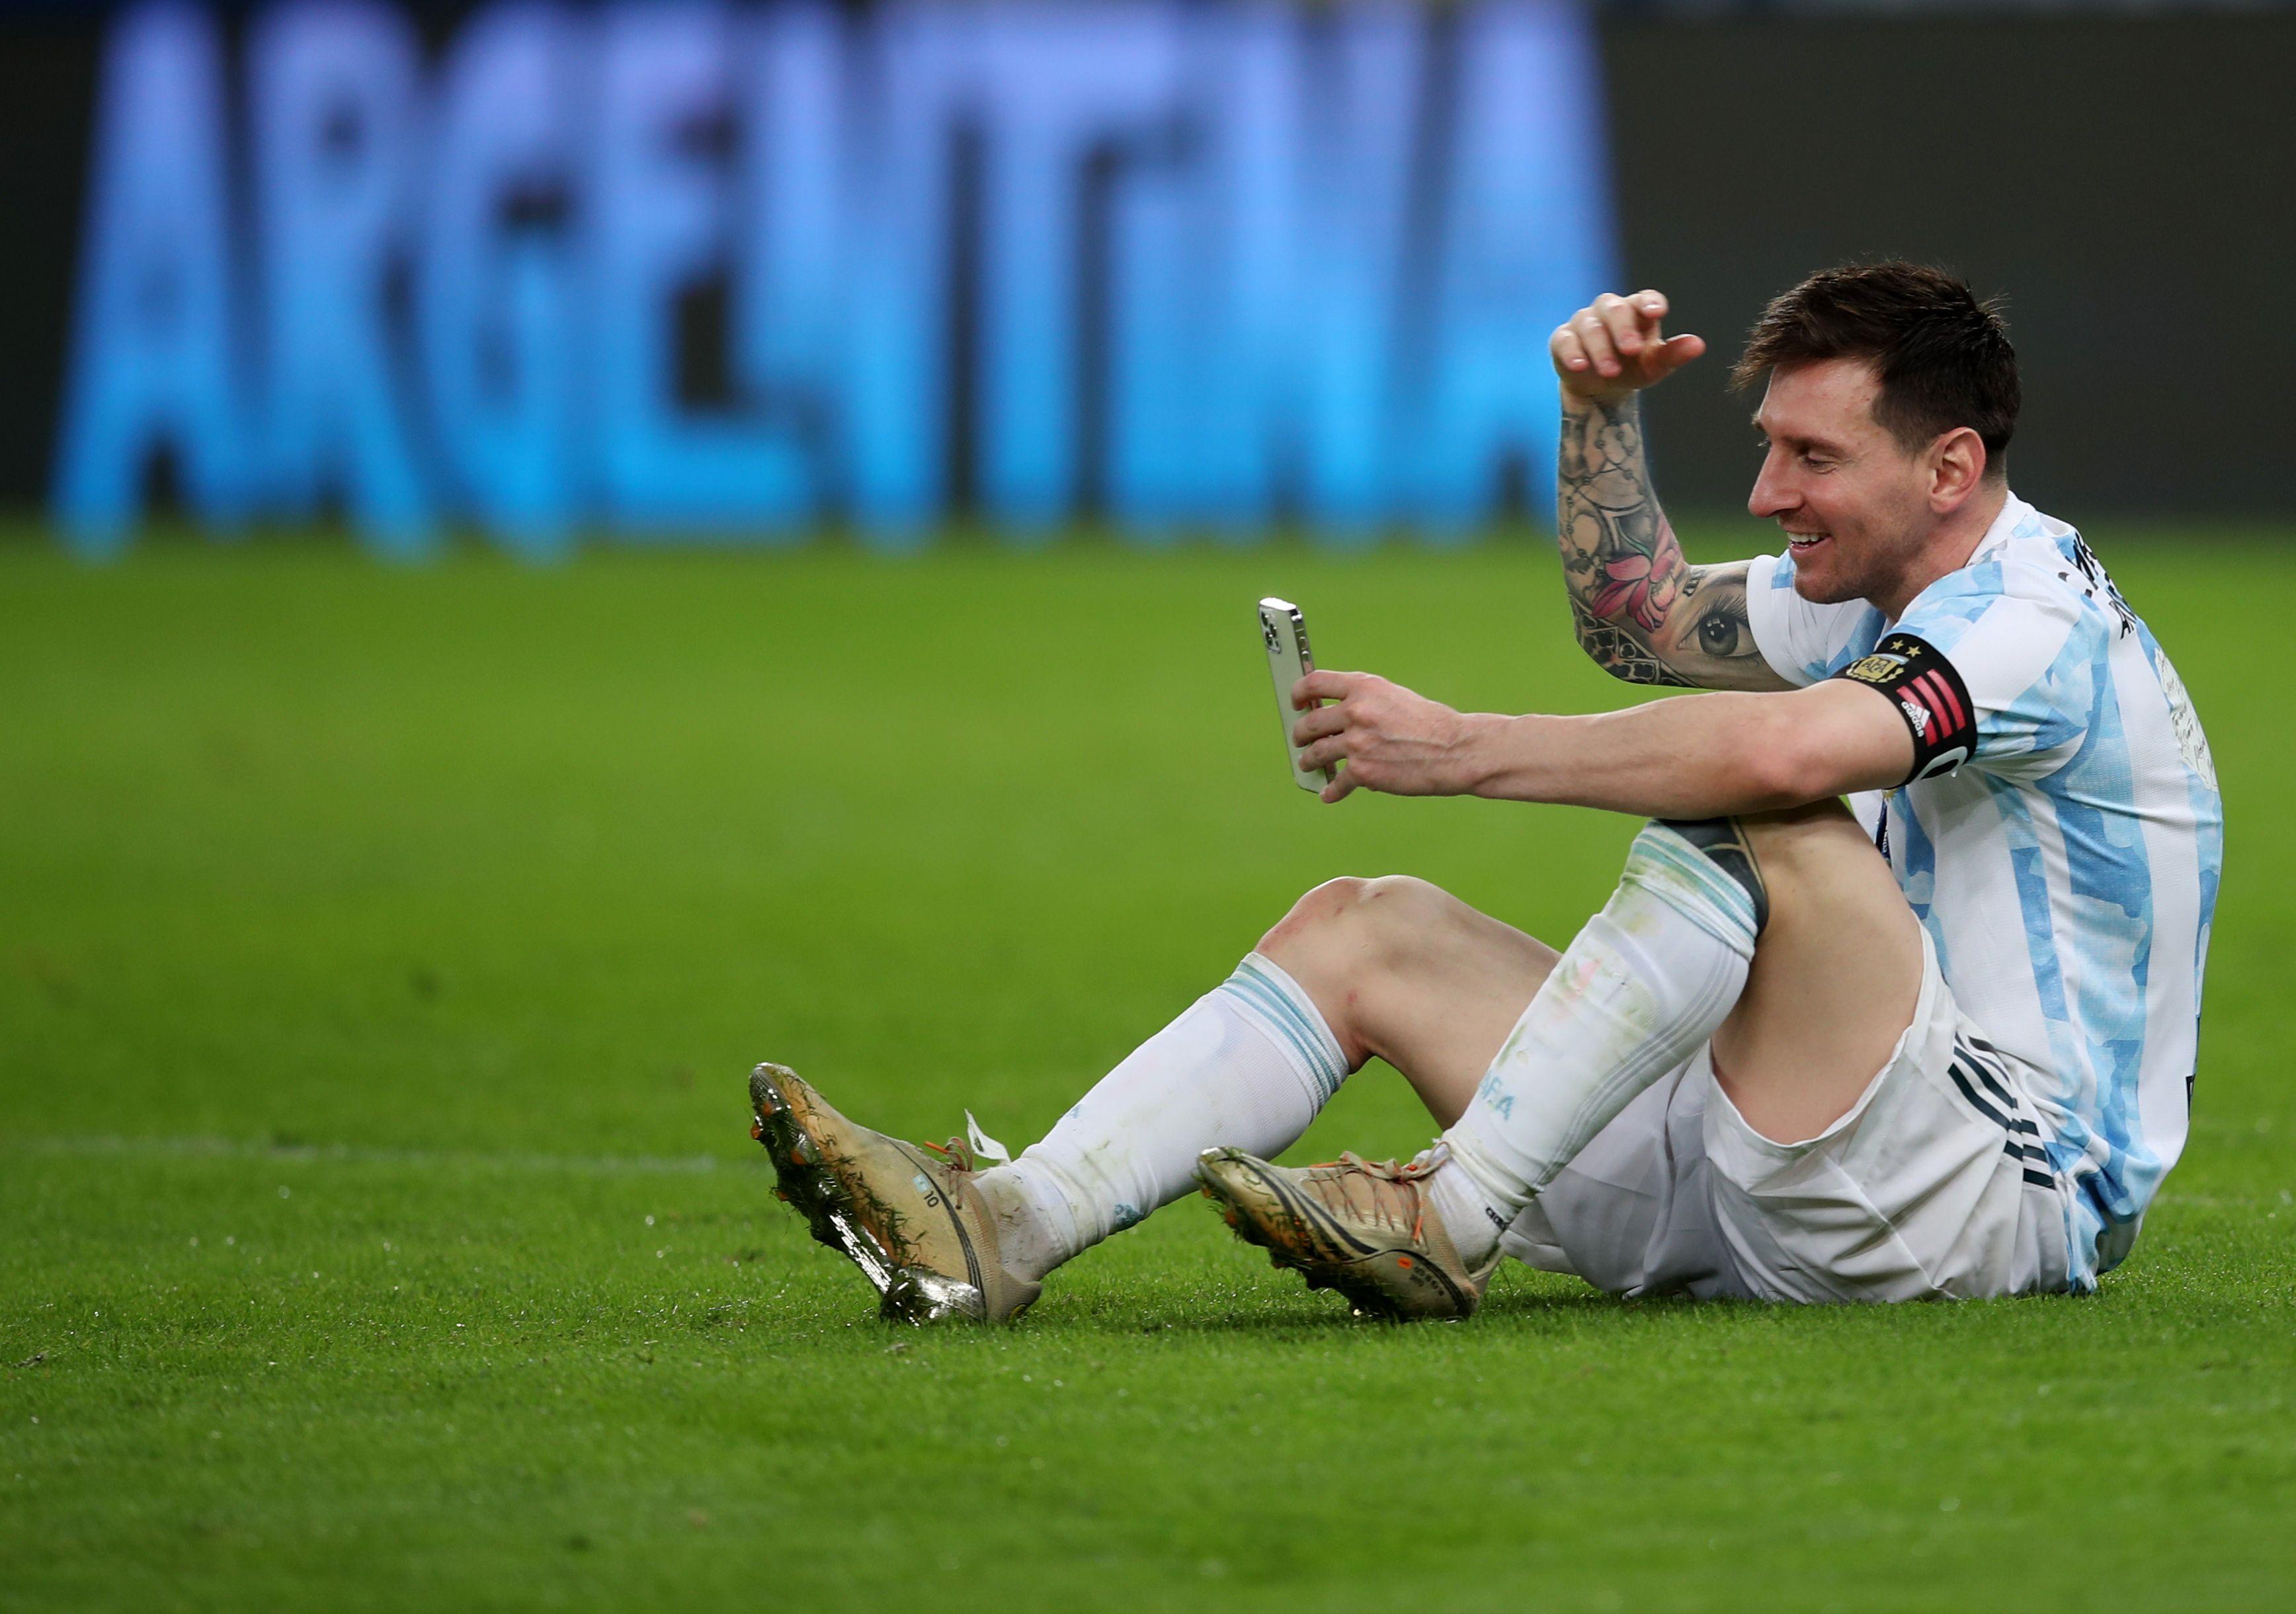 Soccer Football - Copa America  2021 - Final - Brazil v Argentina - Estadio Maracana, Rio de Janeiro, Brazil - July 10, 2021 Argentina's Lionel Messi in a video-call at the pitch after winning the Copa America REUTERS/Ricardo Moraes